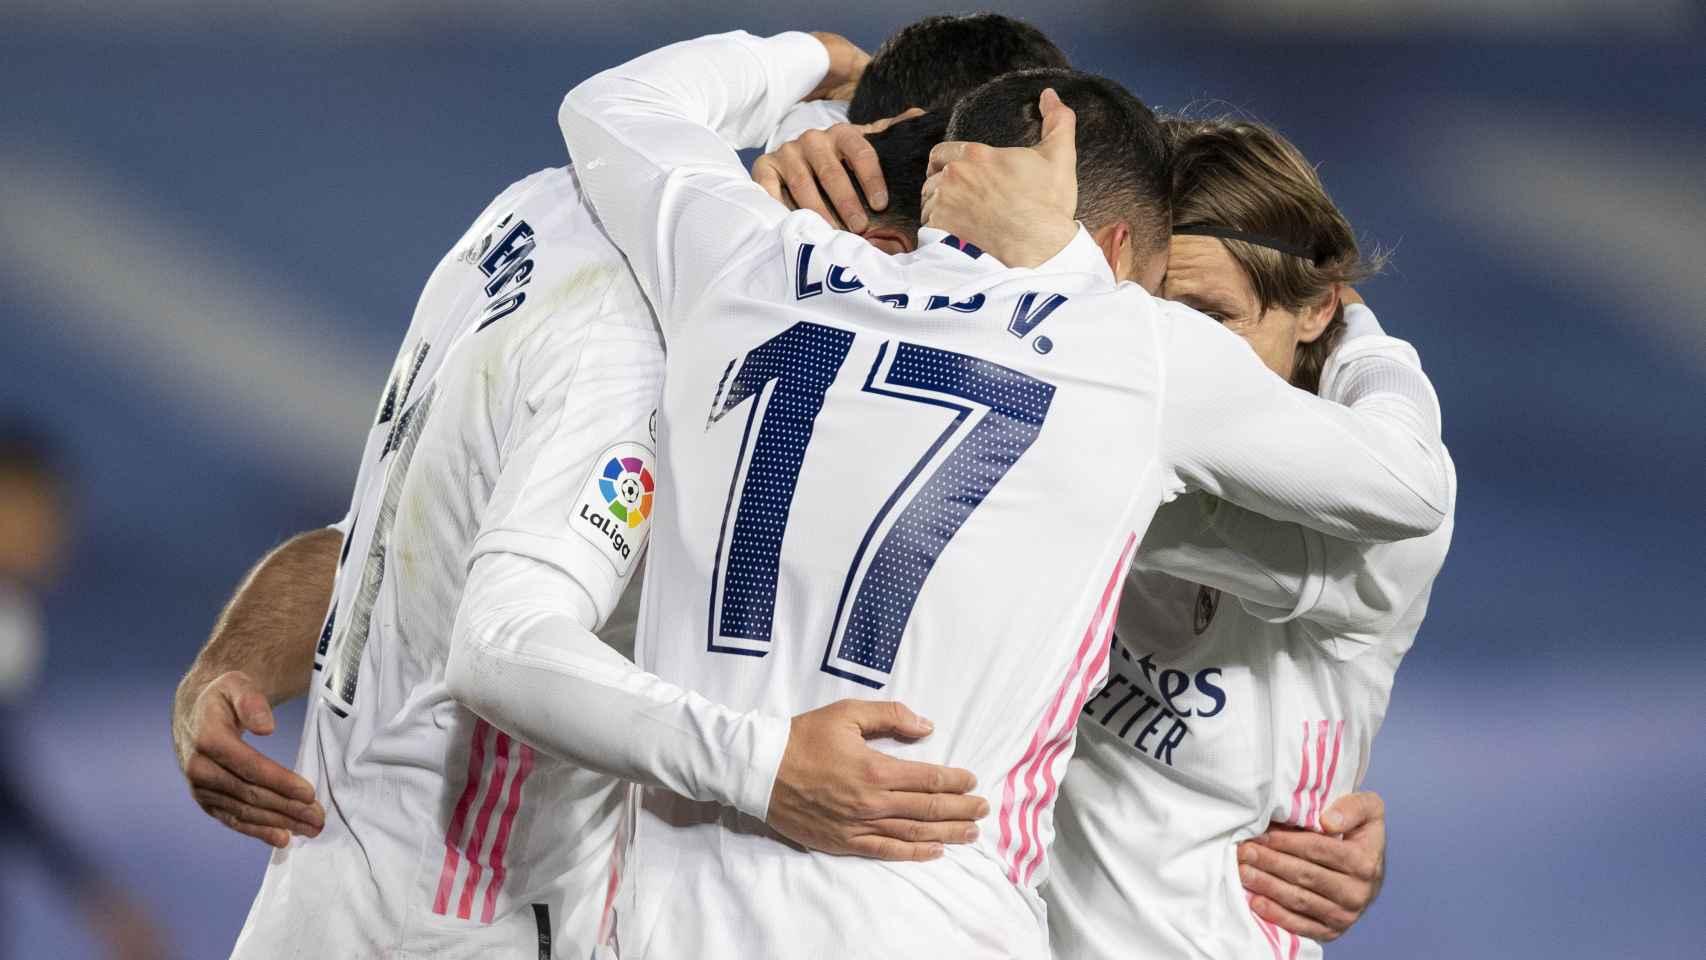 Lucas Vázquez, Marco Asensio y Luka Modric se abrazan celebrando un gol del Real Madrid